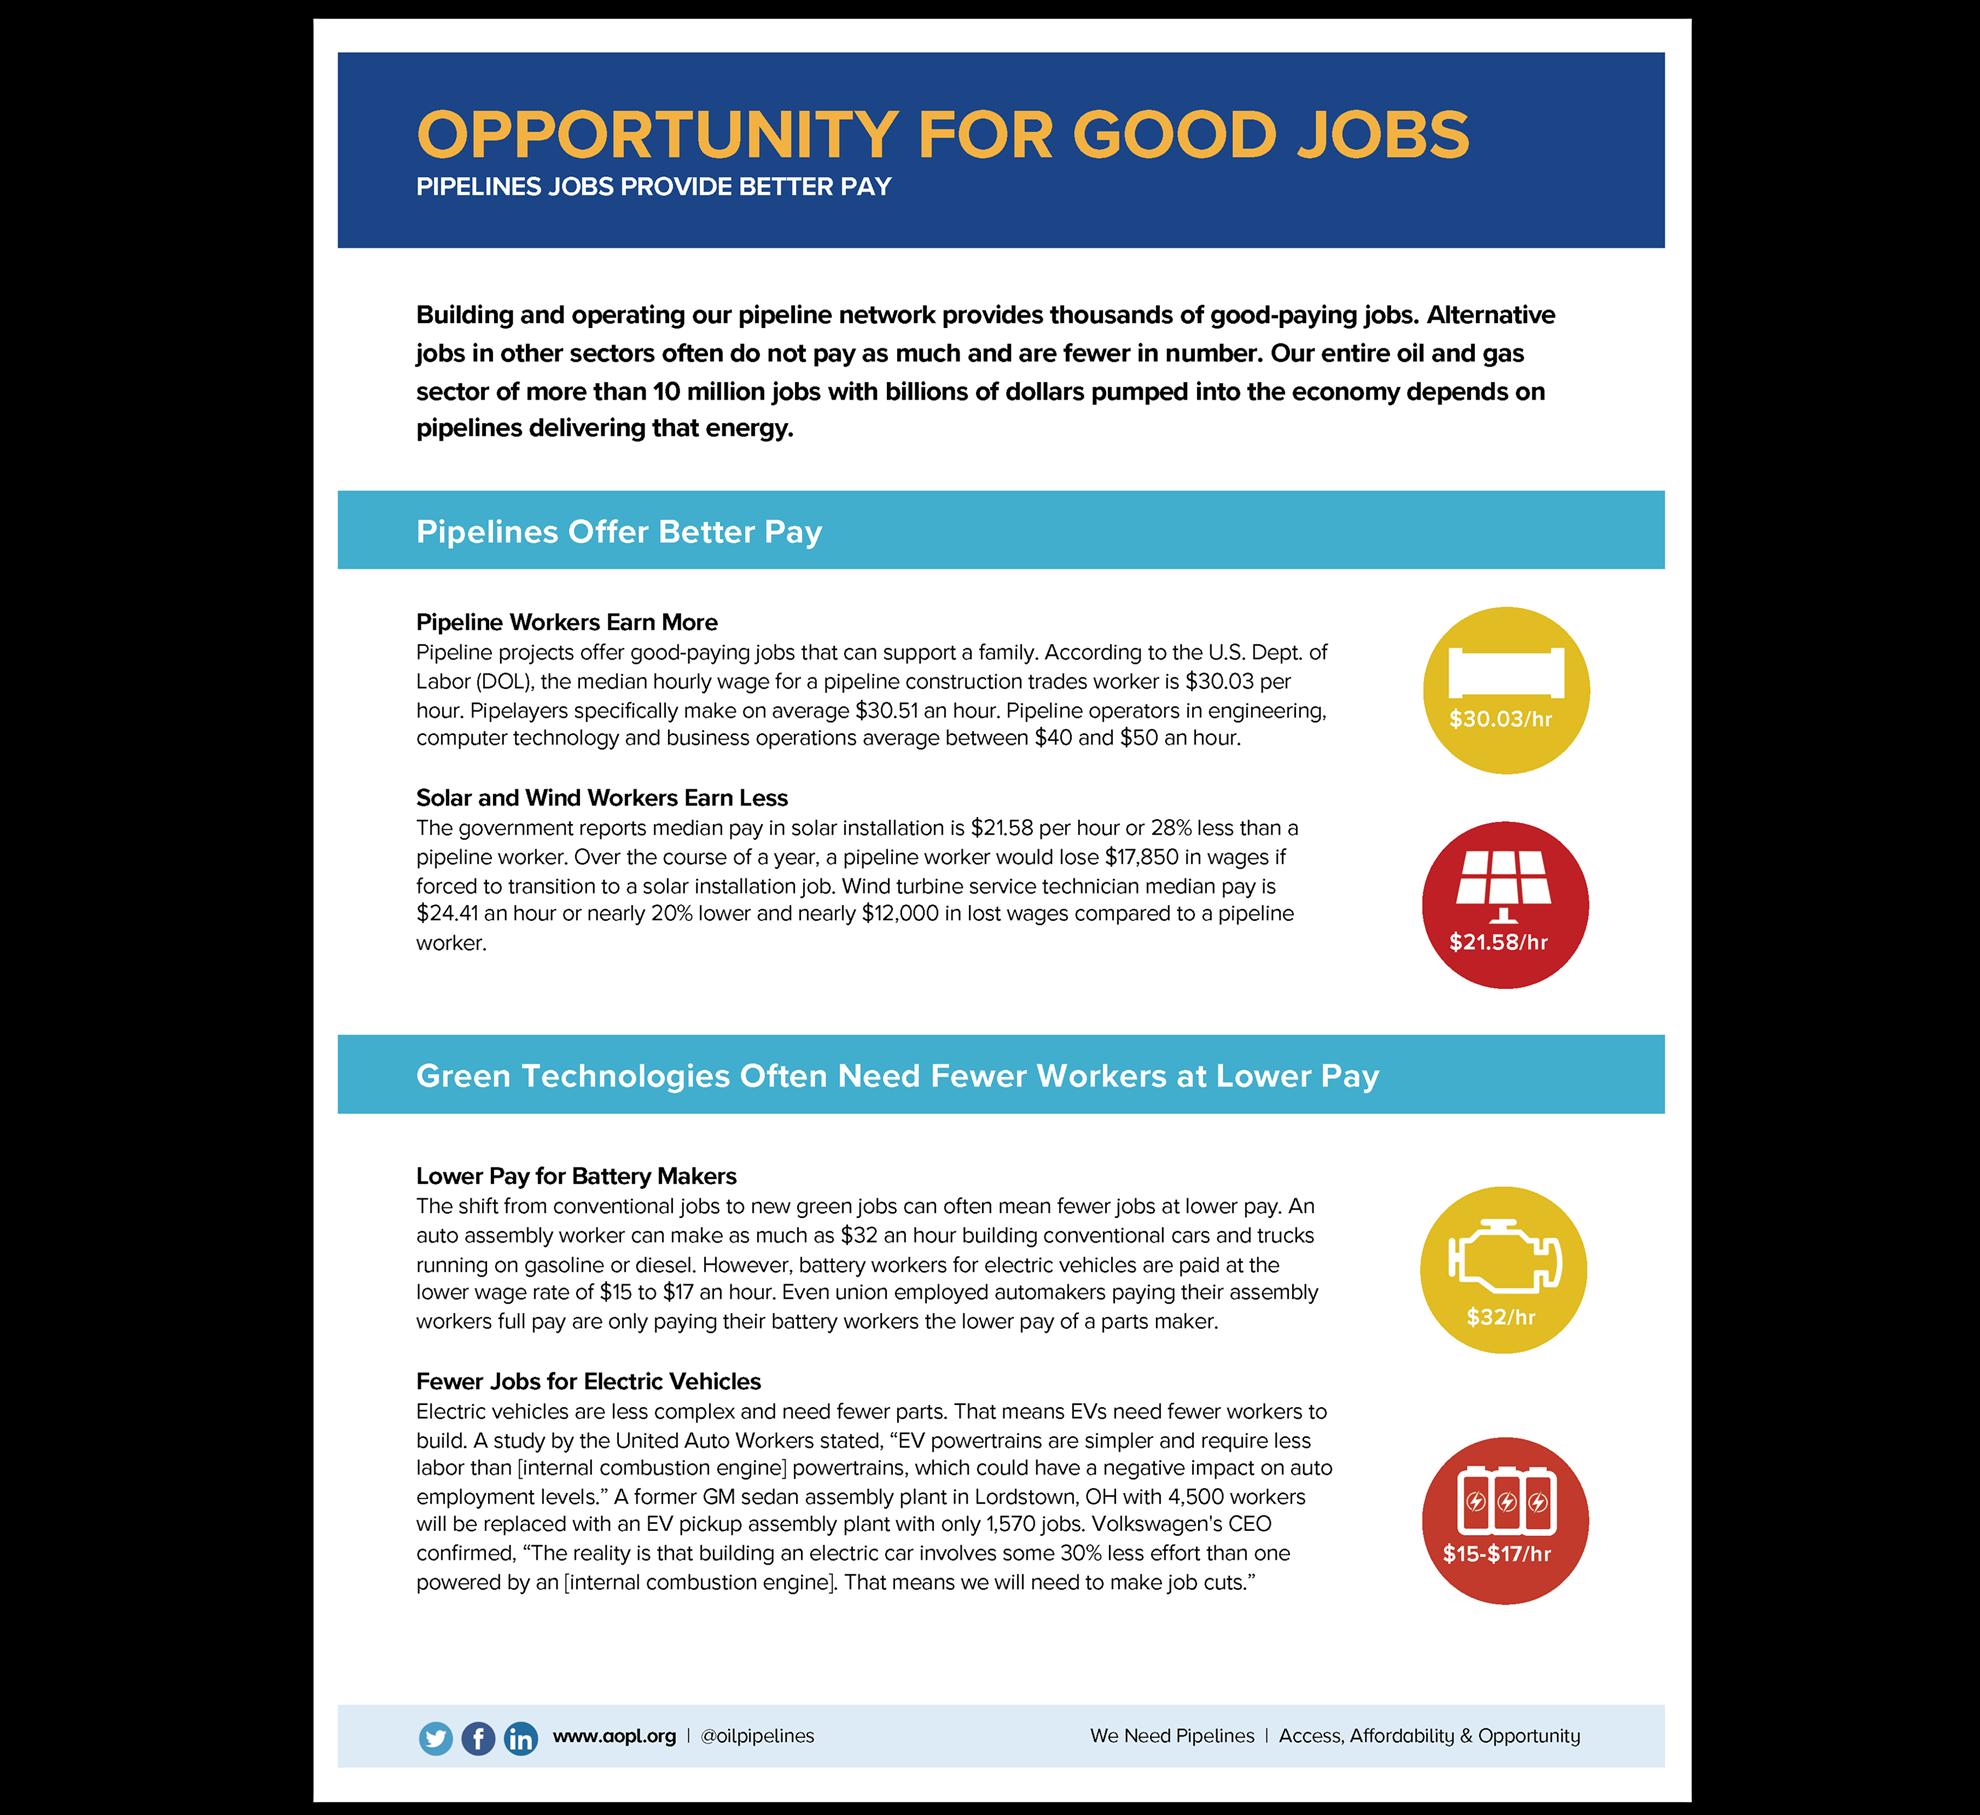 Opportunity for Good Jobs